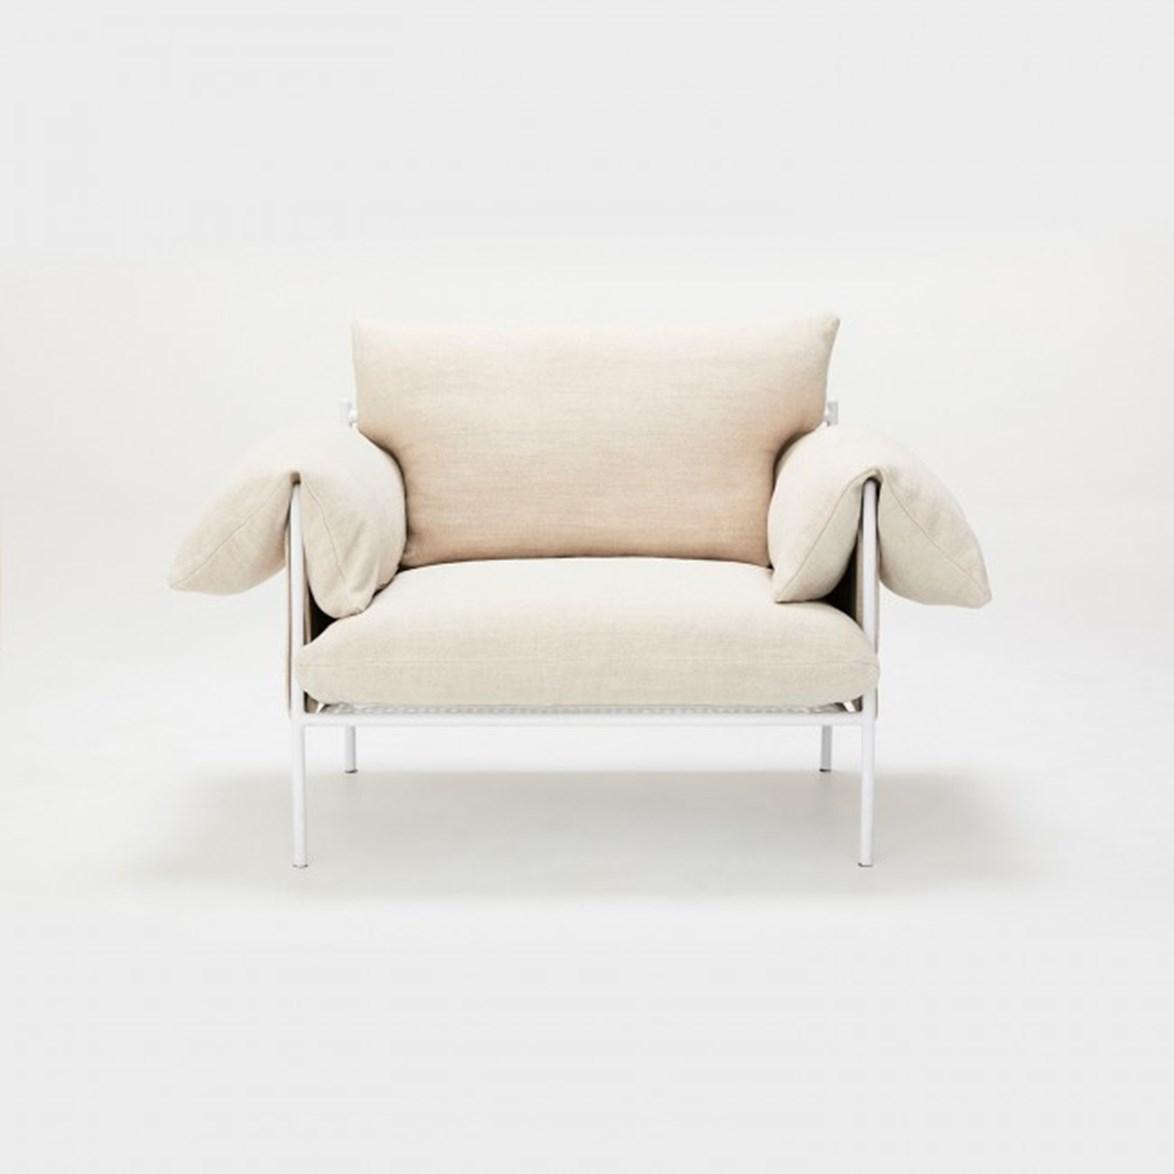 "'Alva' linen lounge chair, $1,595, from [Sarah Ellison](https://sarahellison.com.au/collections/the-new-wave/products/alva-lounge-chair-linen?variant=59778981515|target=""_blank""|rel=""nofollow"")."